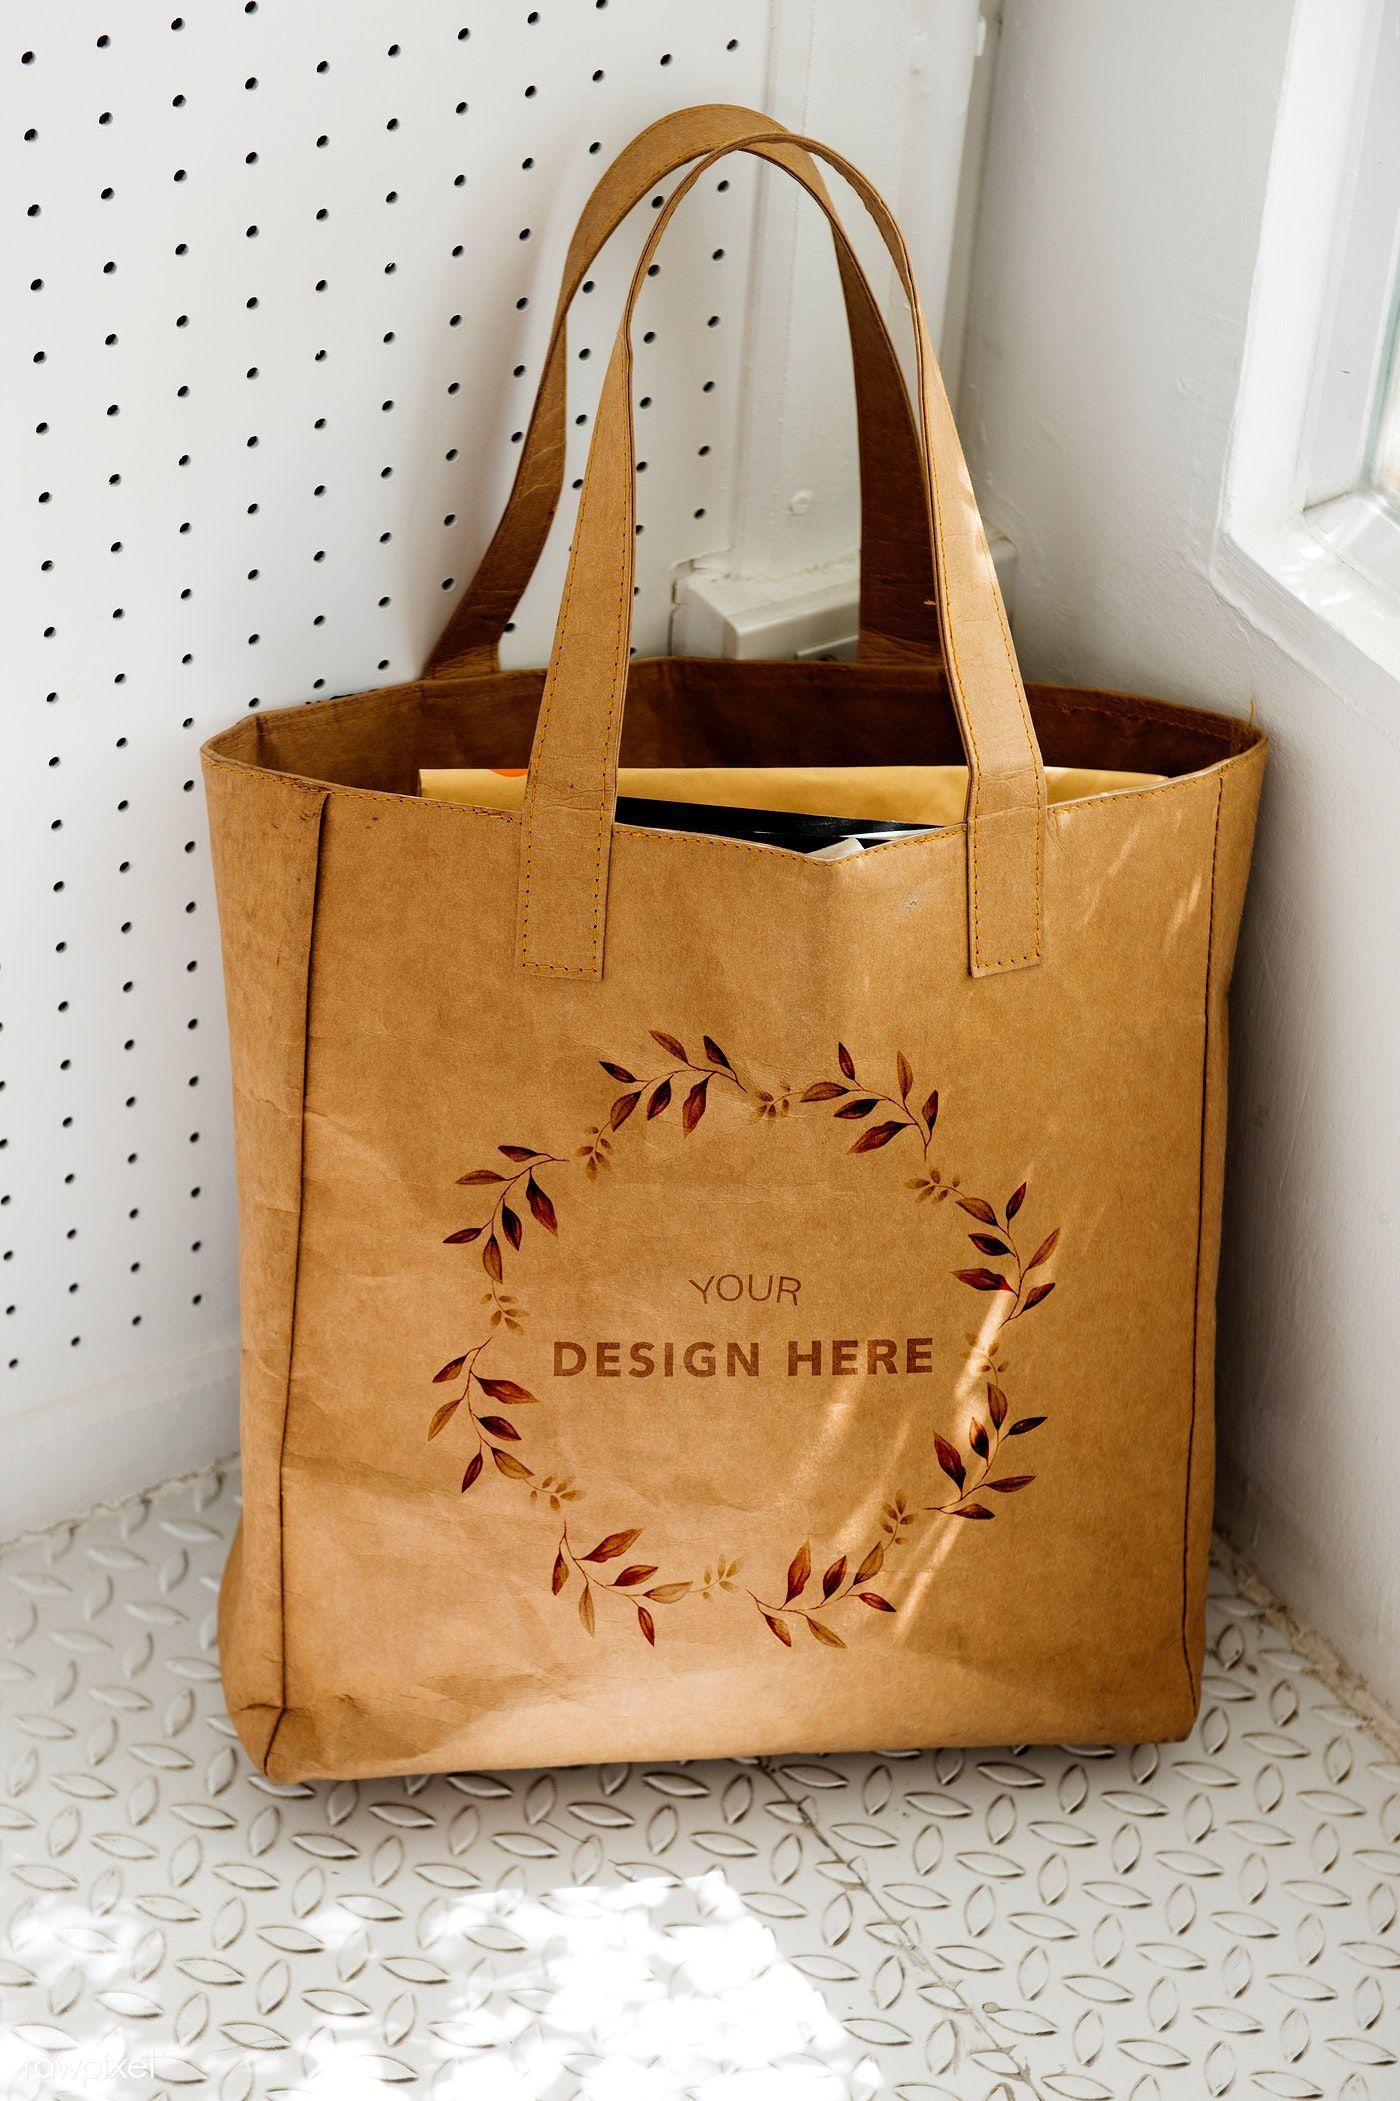 Download Leafy Frame On A Tote Bag Mockup Illustration Premium Image By Rawpixel Com Adj Tote Bag Canvas Design Bags Brown Tote Bag